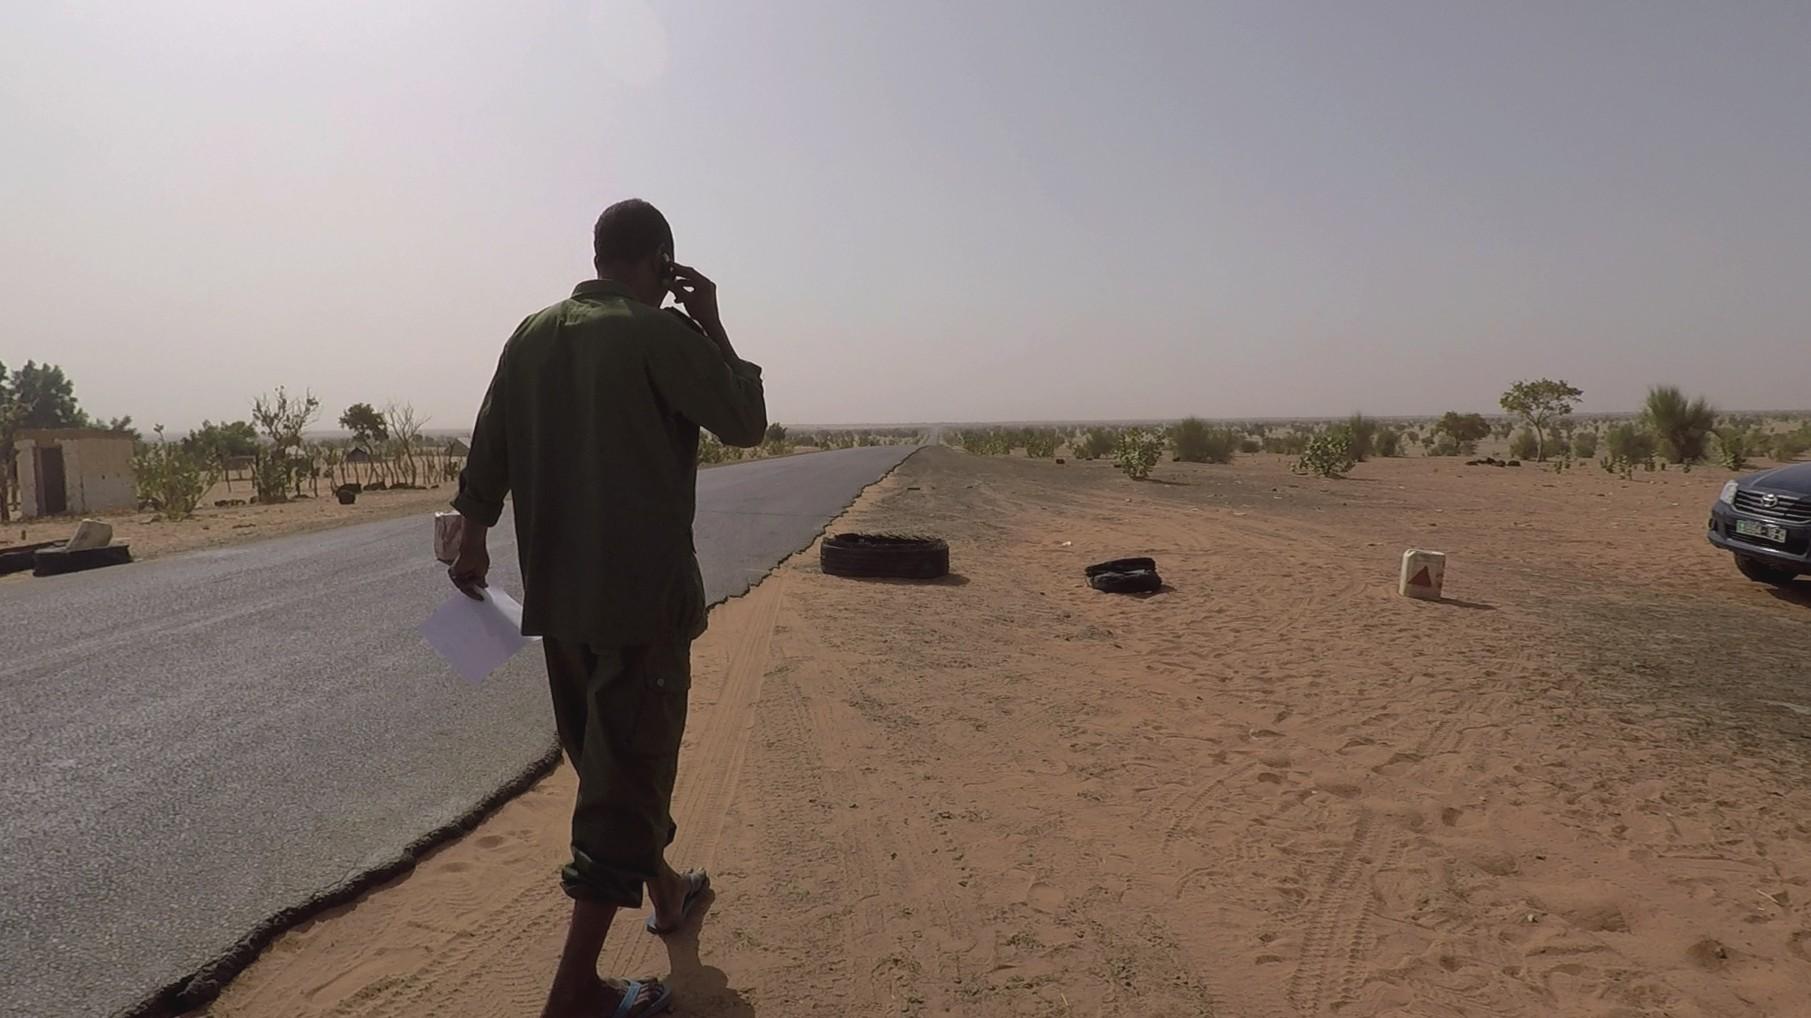 milico mauritania pablocaminante - Mauritania 4/5, Nouakchott a Gogui